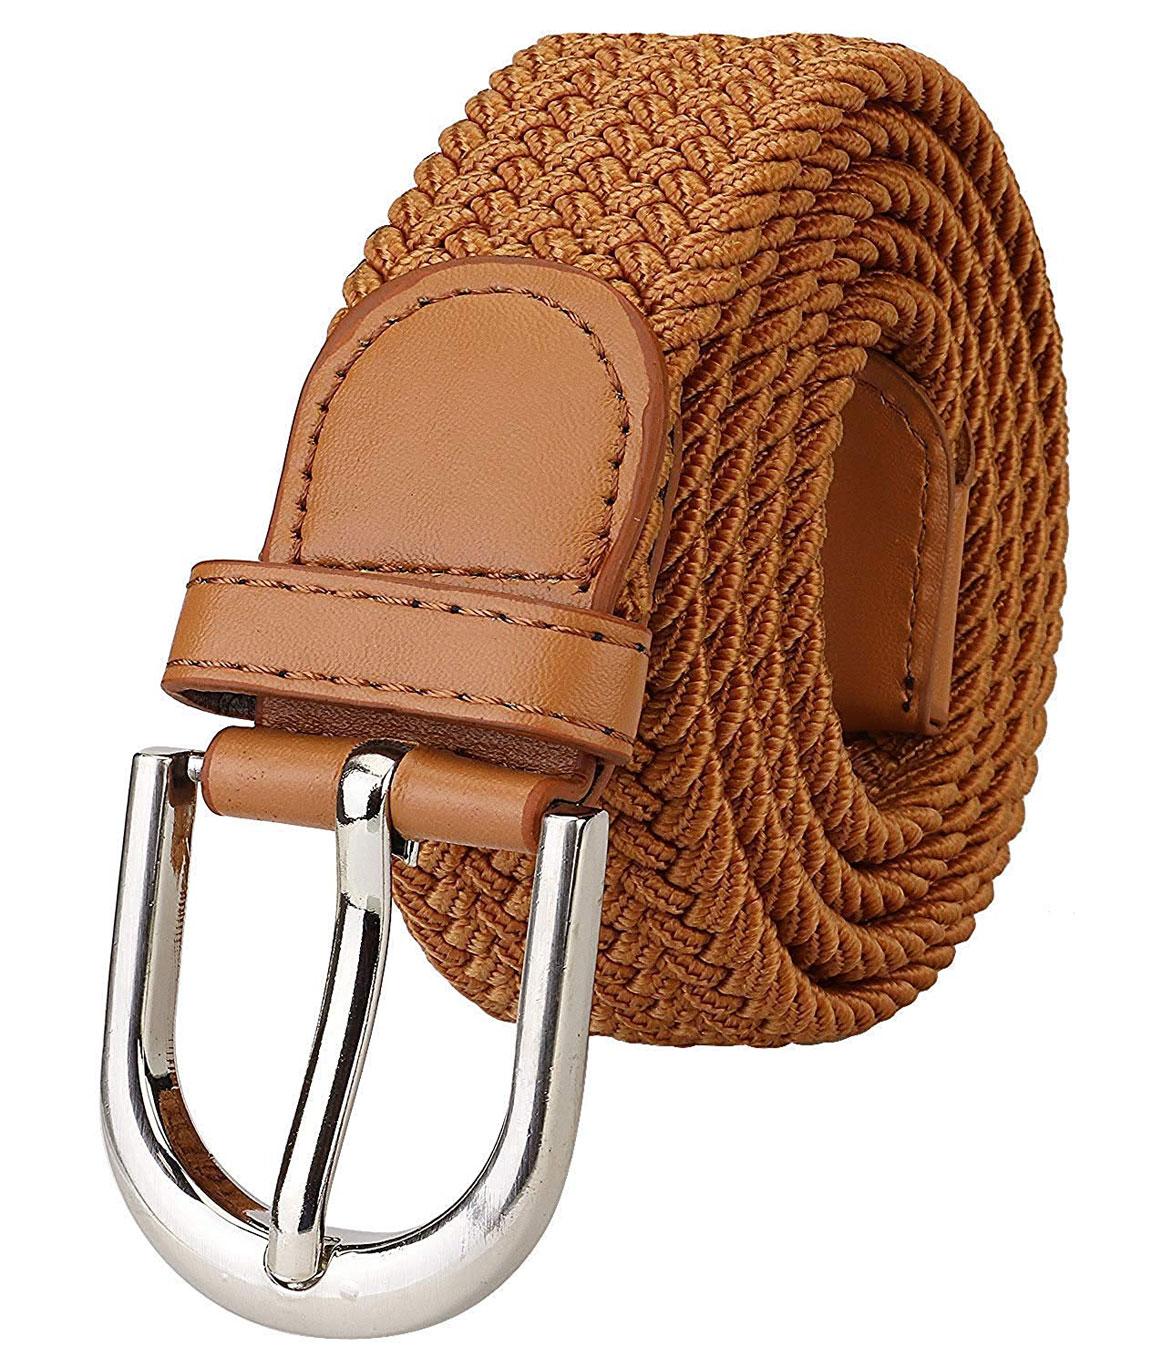 ZORO Stretchable braided cotton belt for men under 200, mens belt, flexible, fits on upto 36 inch waist size